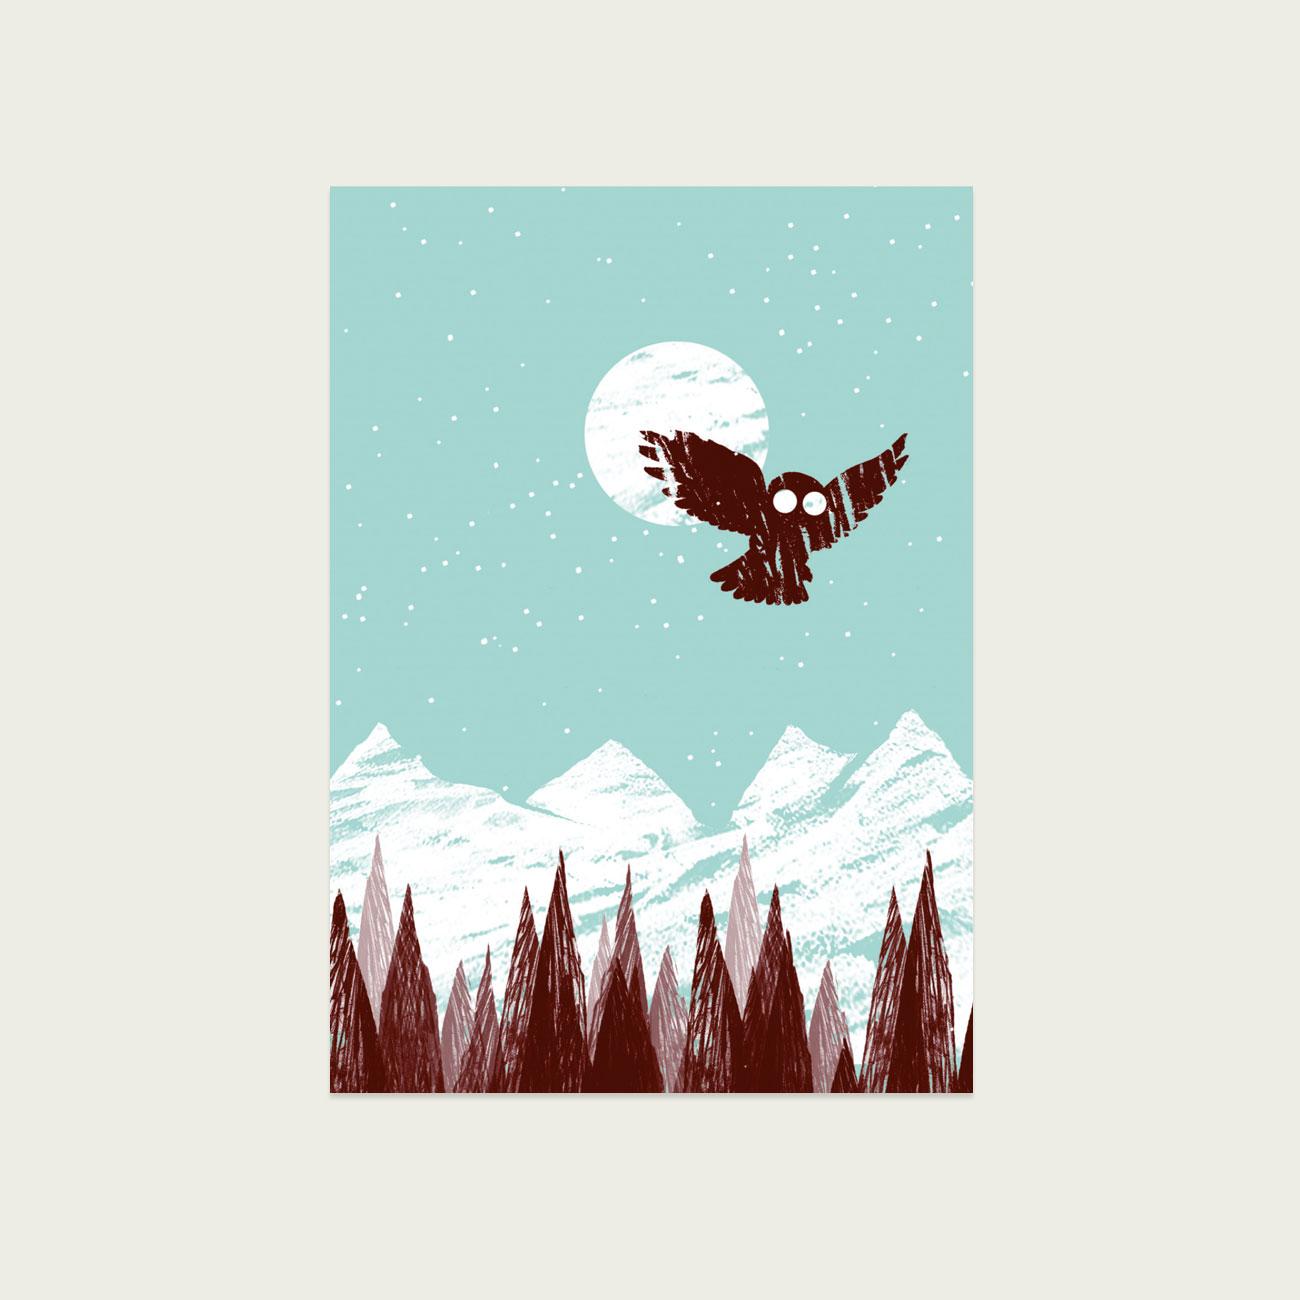 Wintereule, illustrierte Postkarte, Eule in Brauntönen fliegt vor Mond,